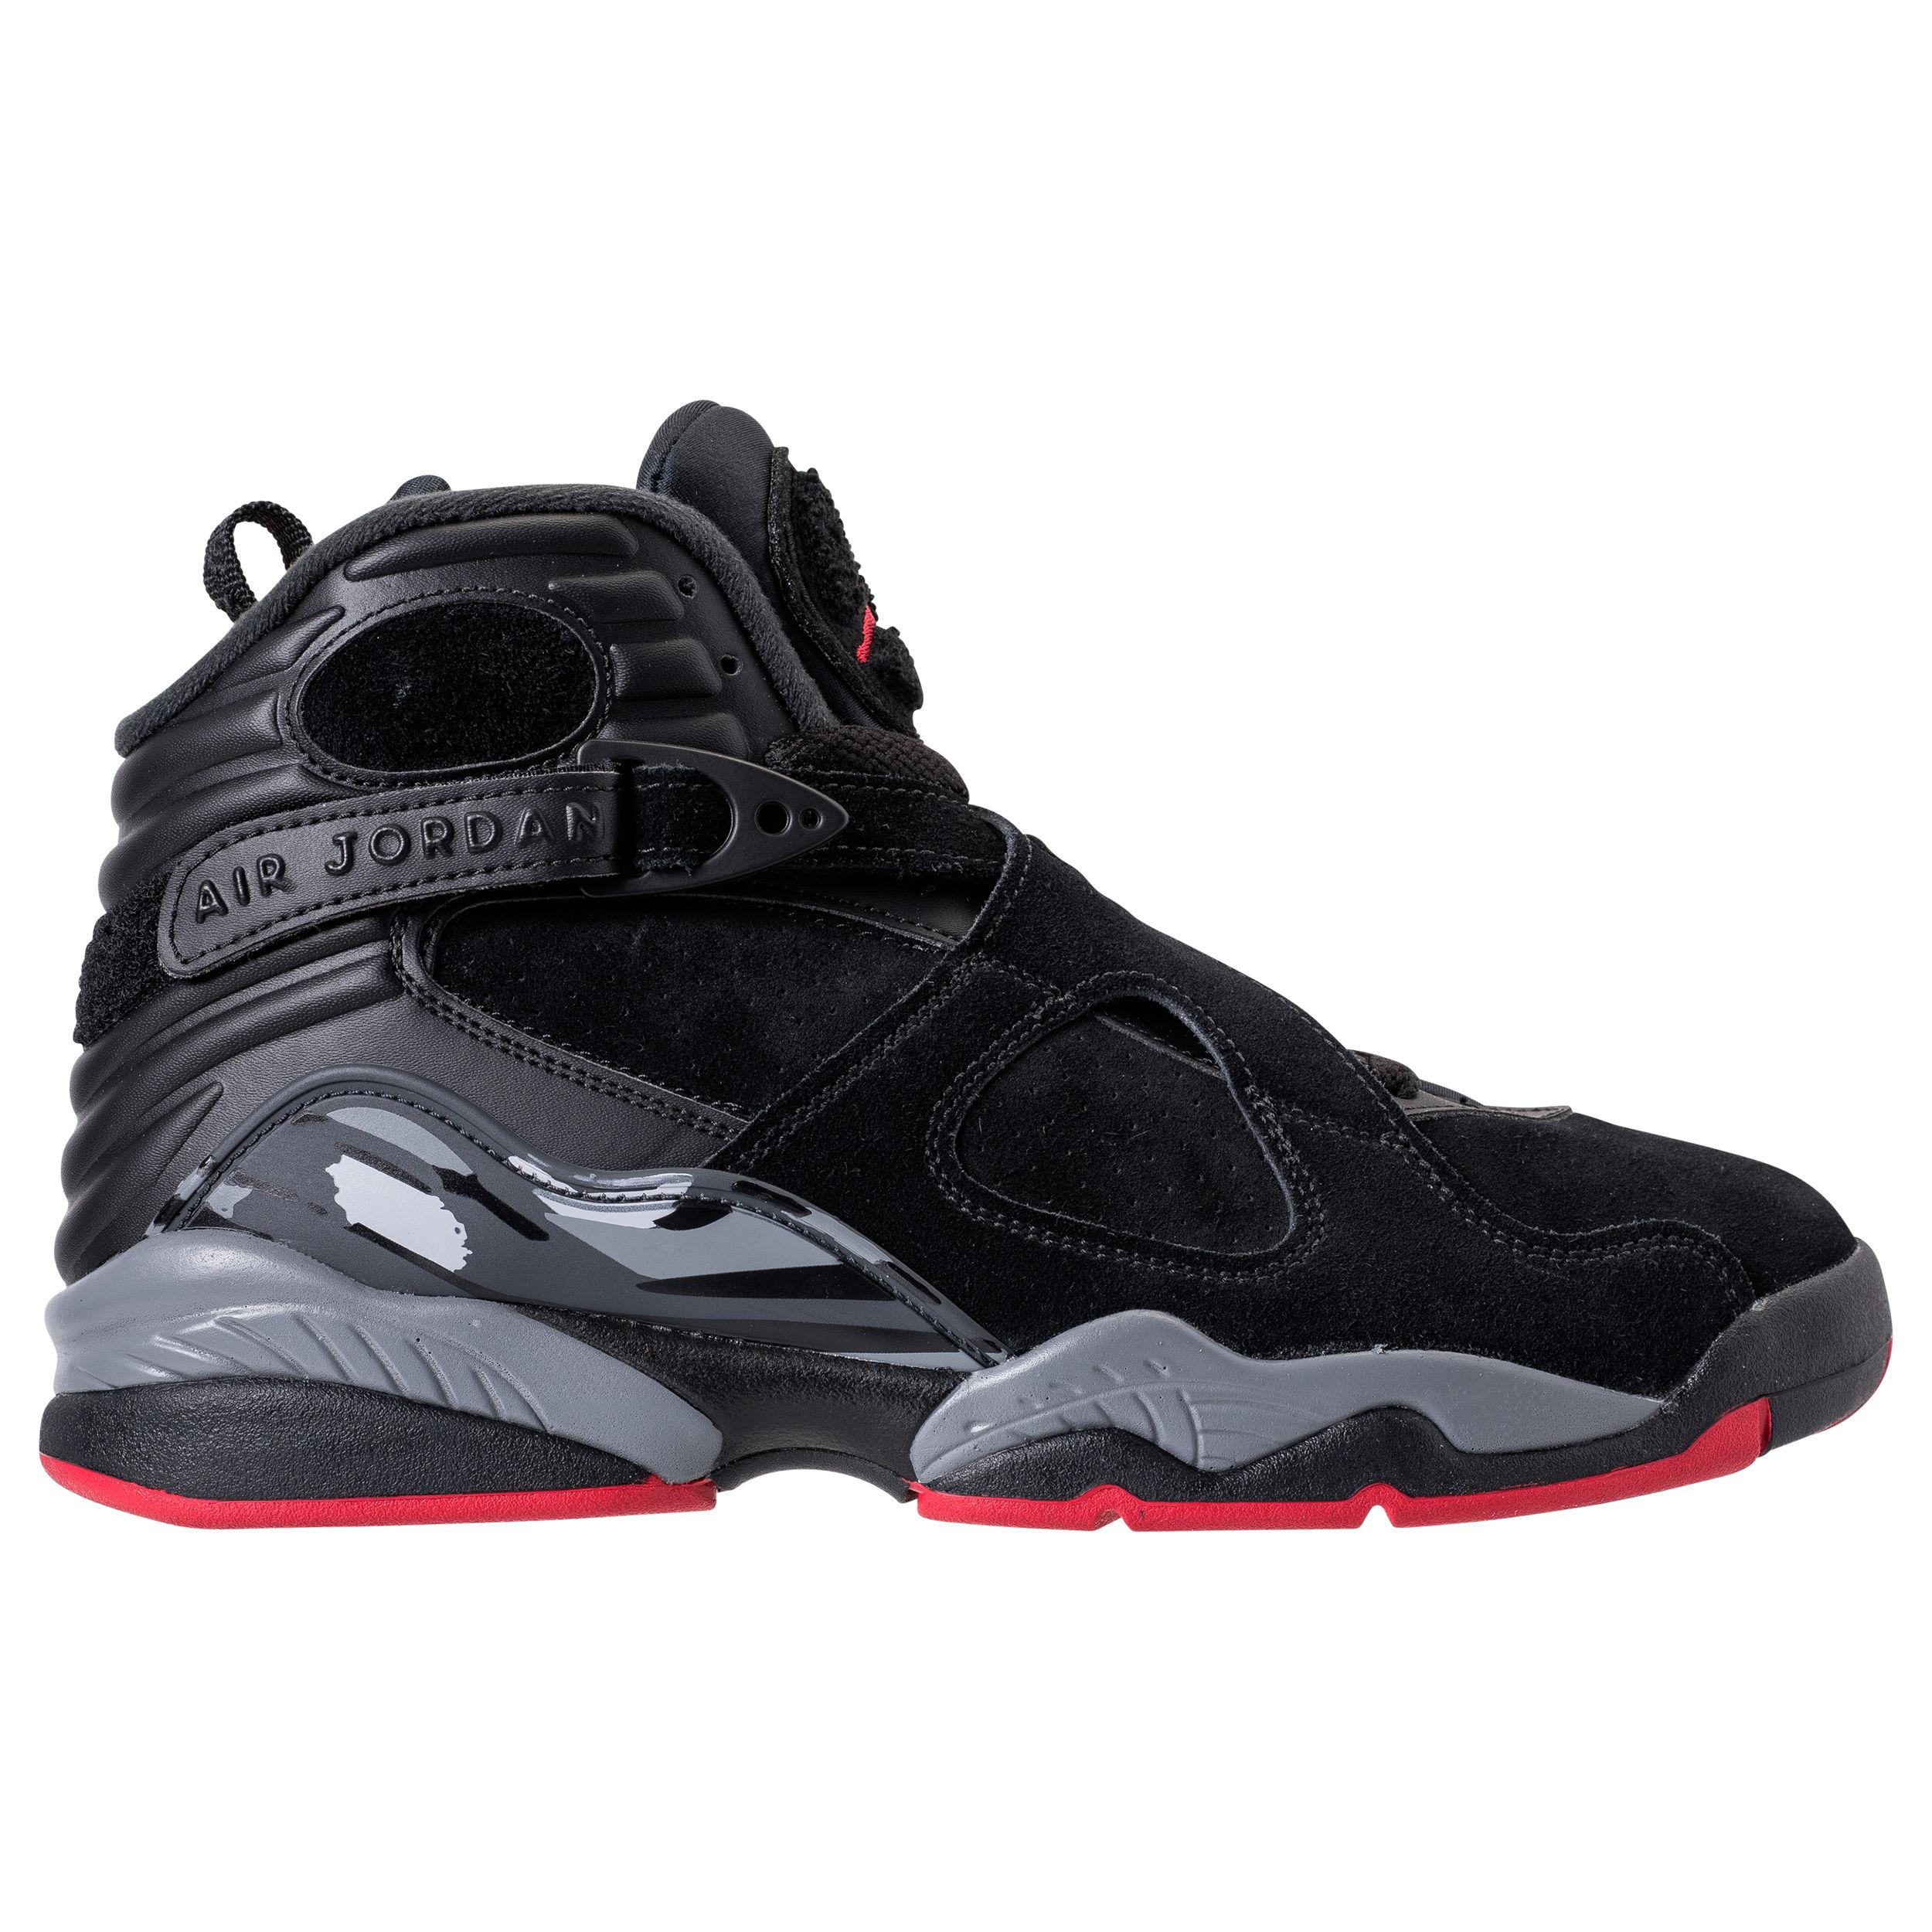 The Air Jordan 8 Retro in Black/Gym Red